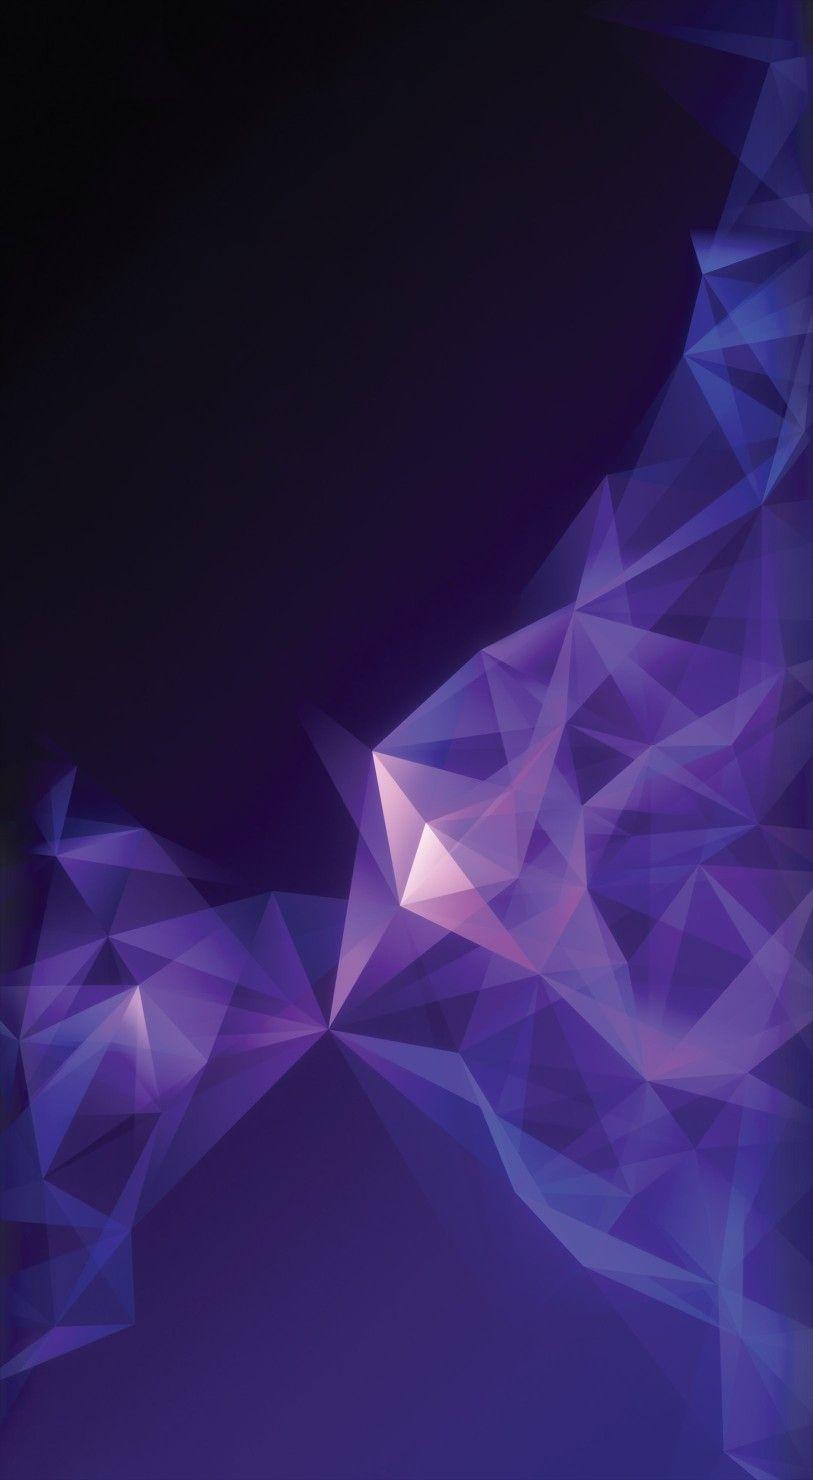 S9 Purple Wallpaper Clean Galaxy Colour Abstract Digital